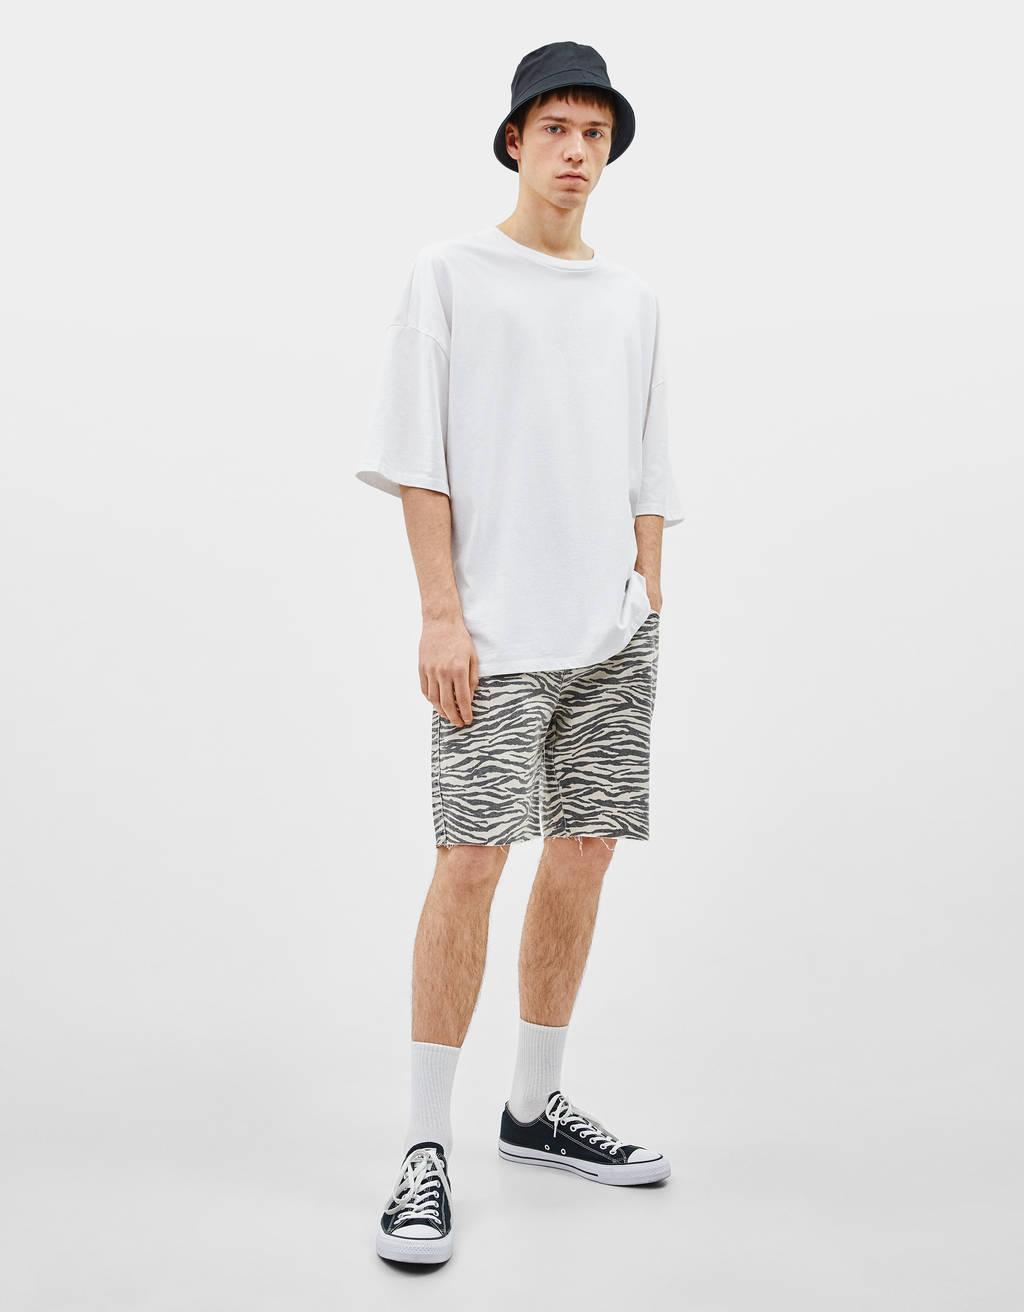 Printed Bermuda shorts